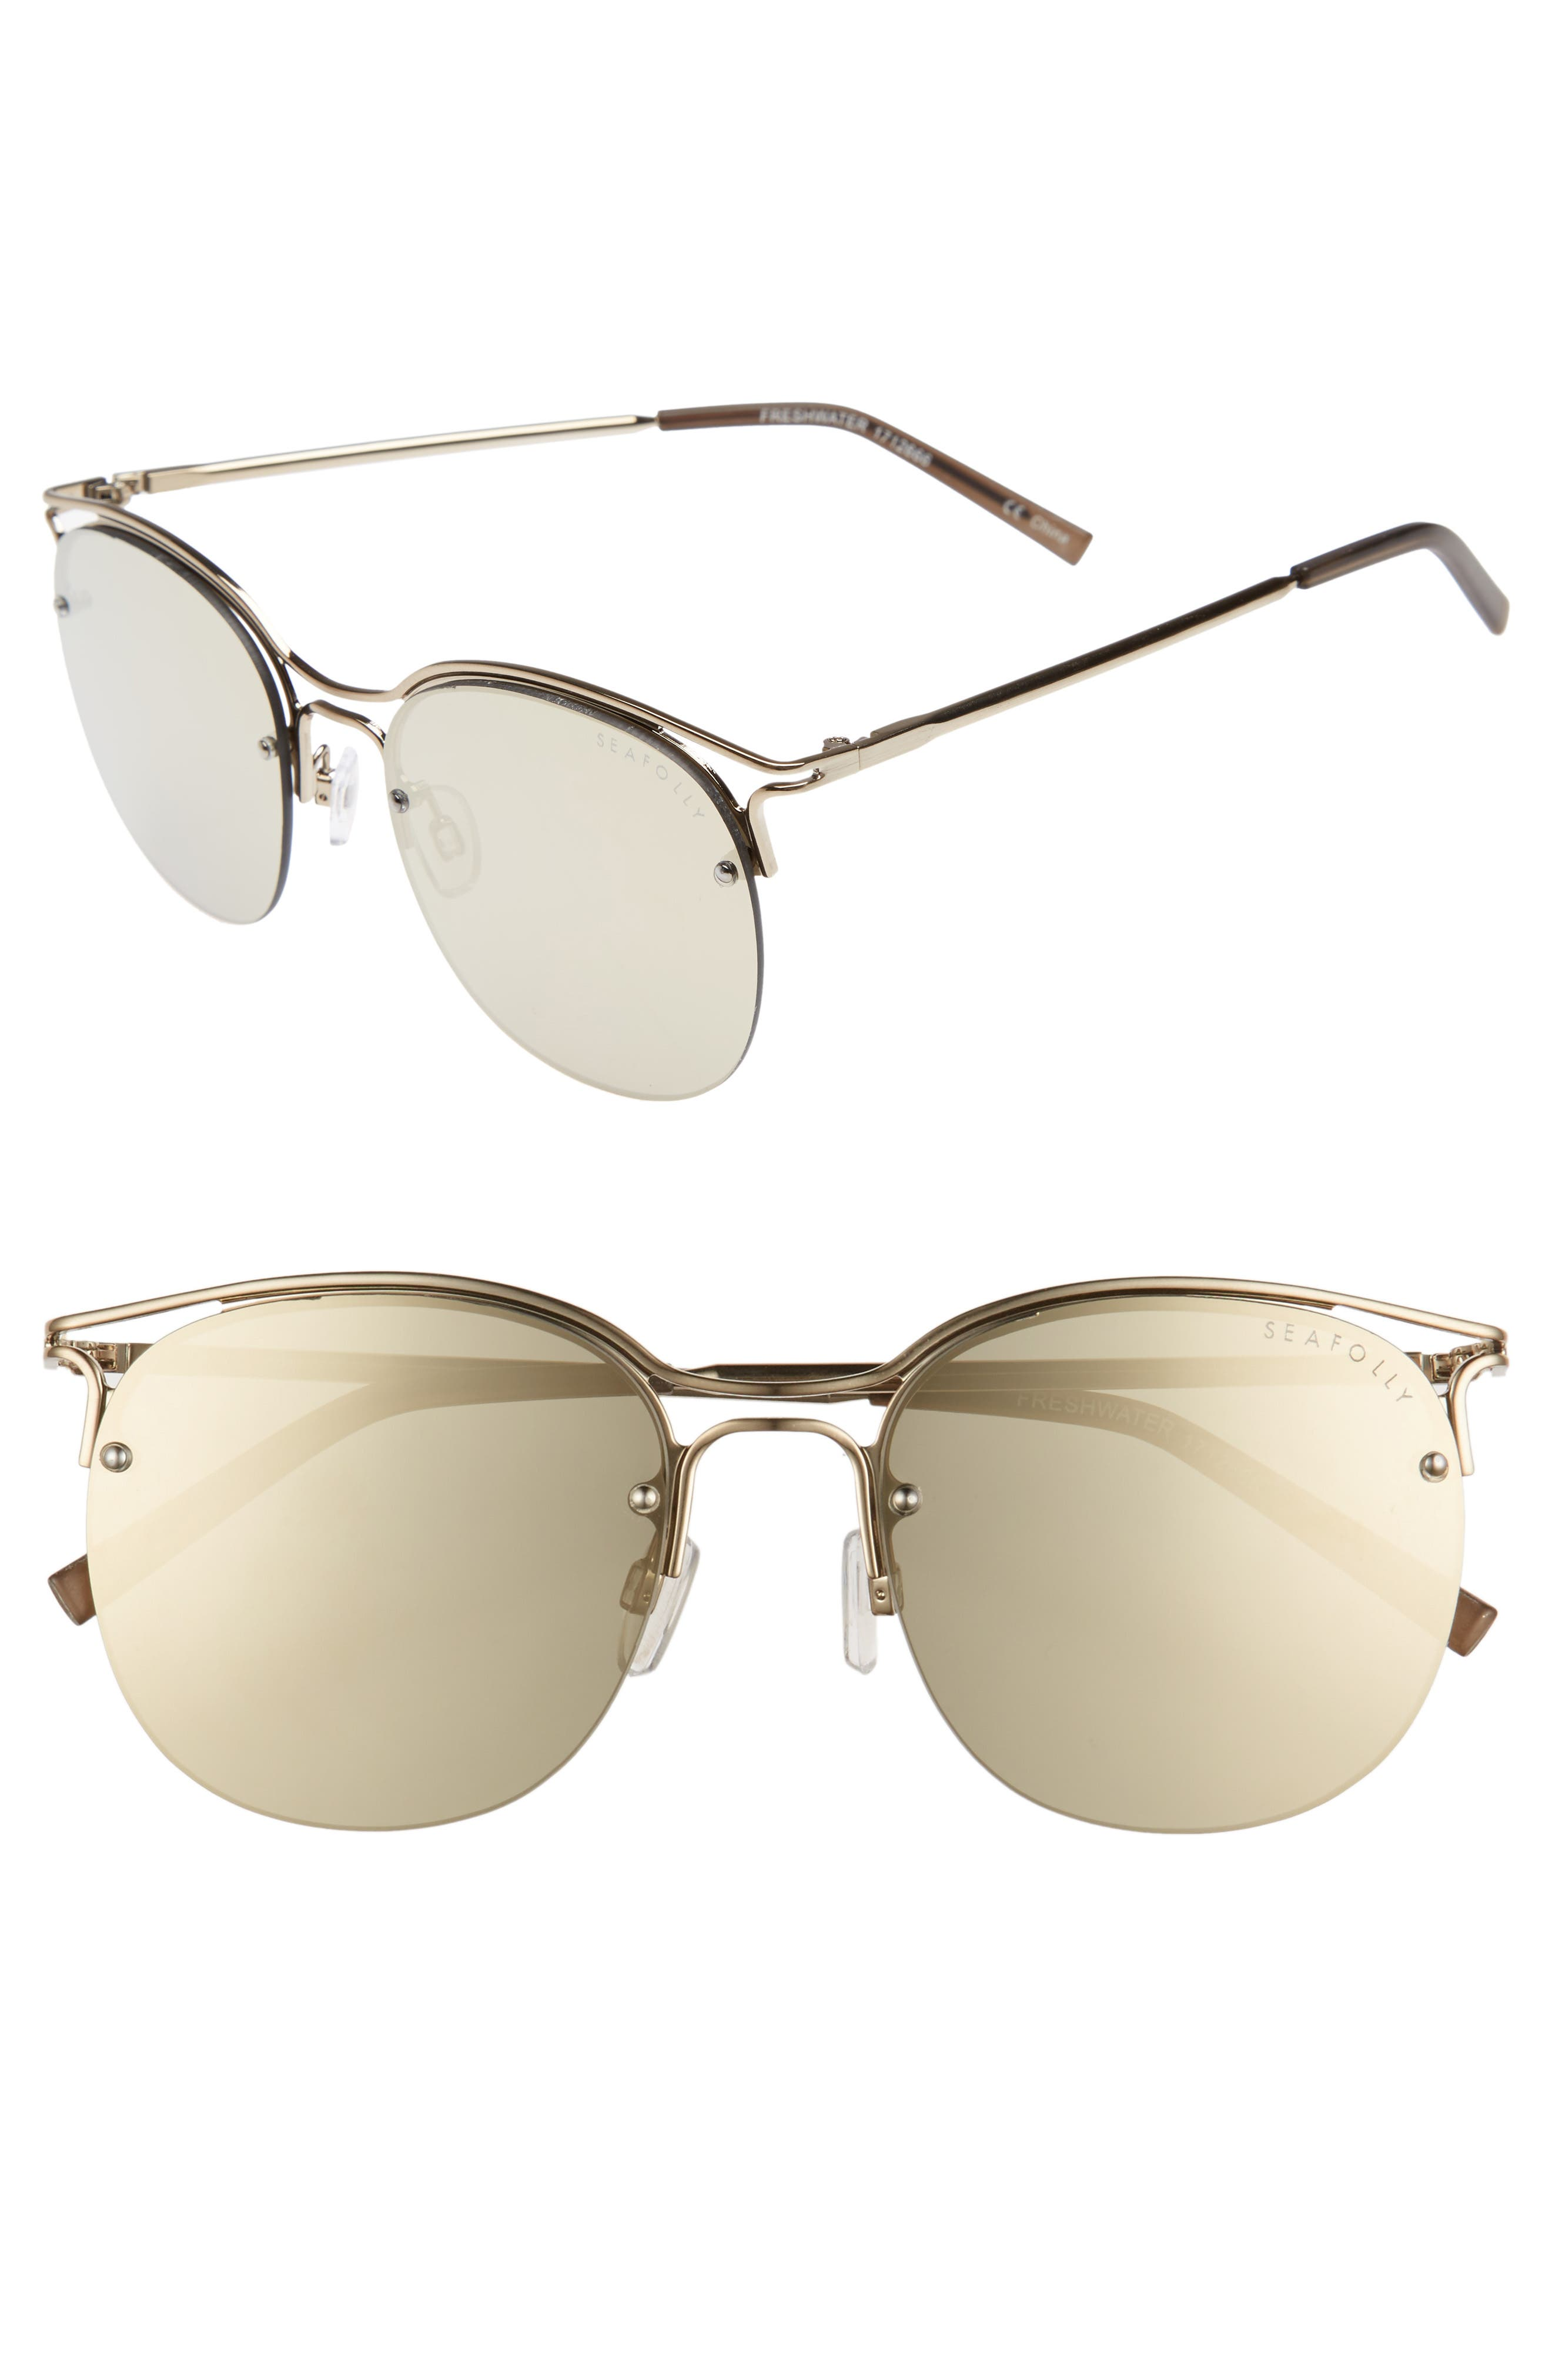 Freshwater 55m Metal Sunglasses,                             Main thumbnail 1, color,                             Moss